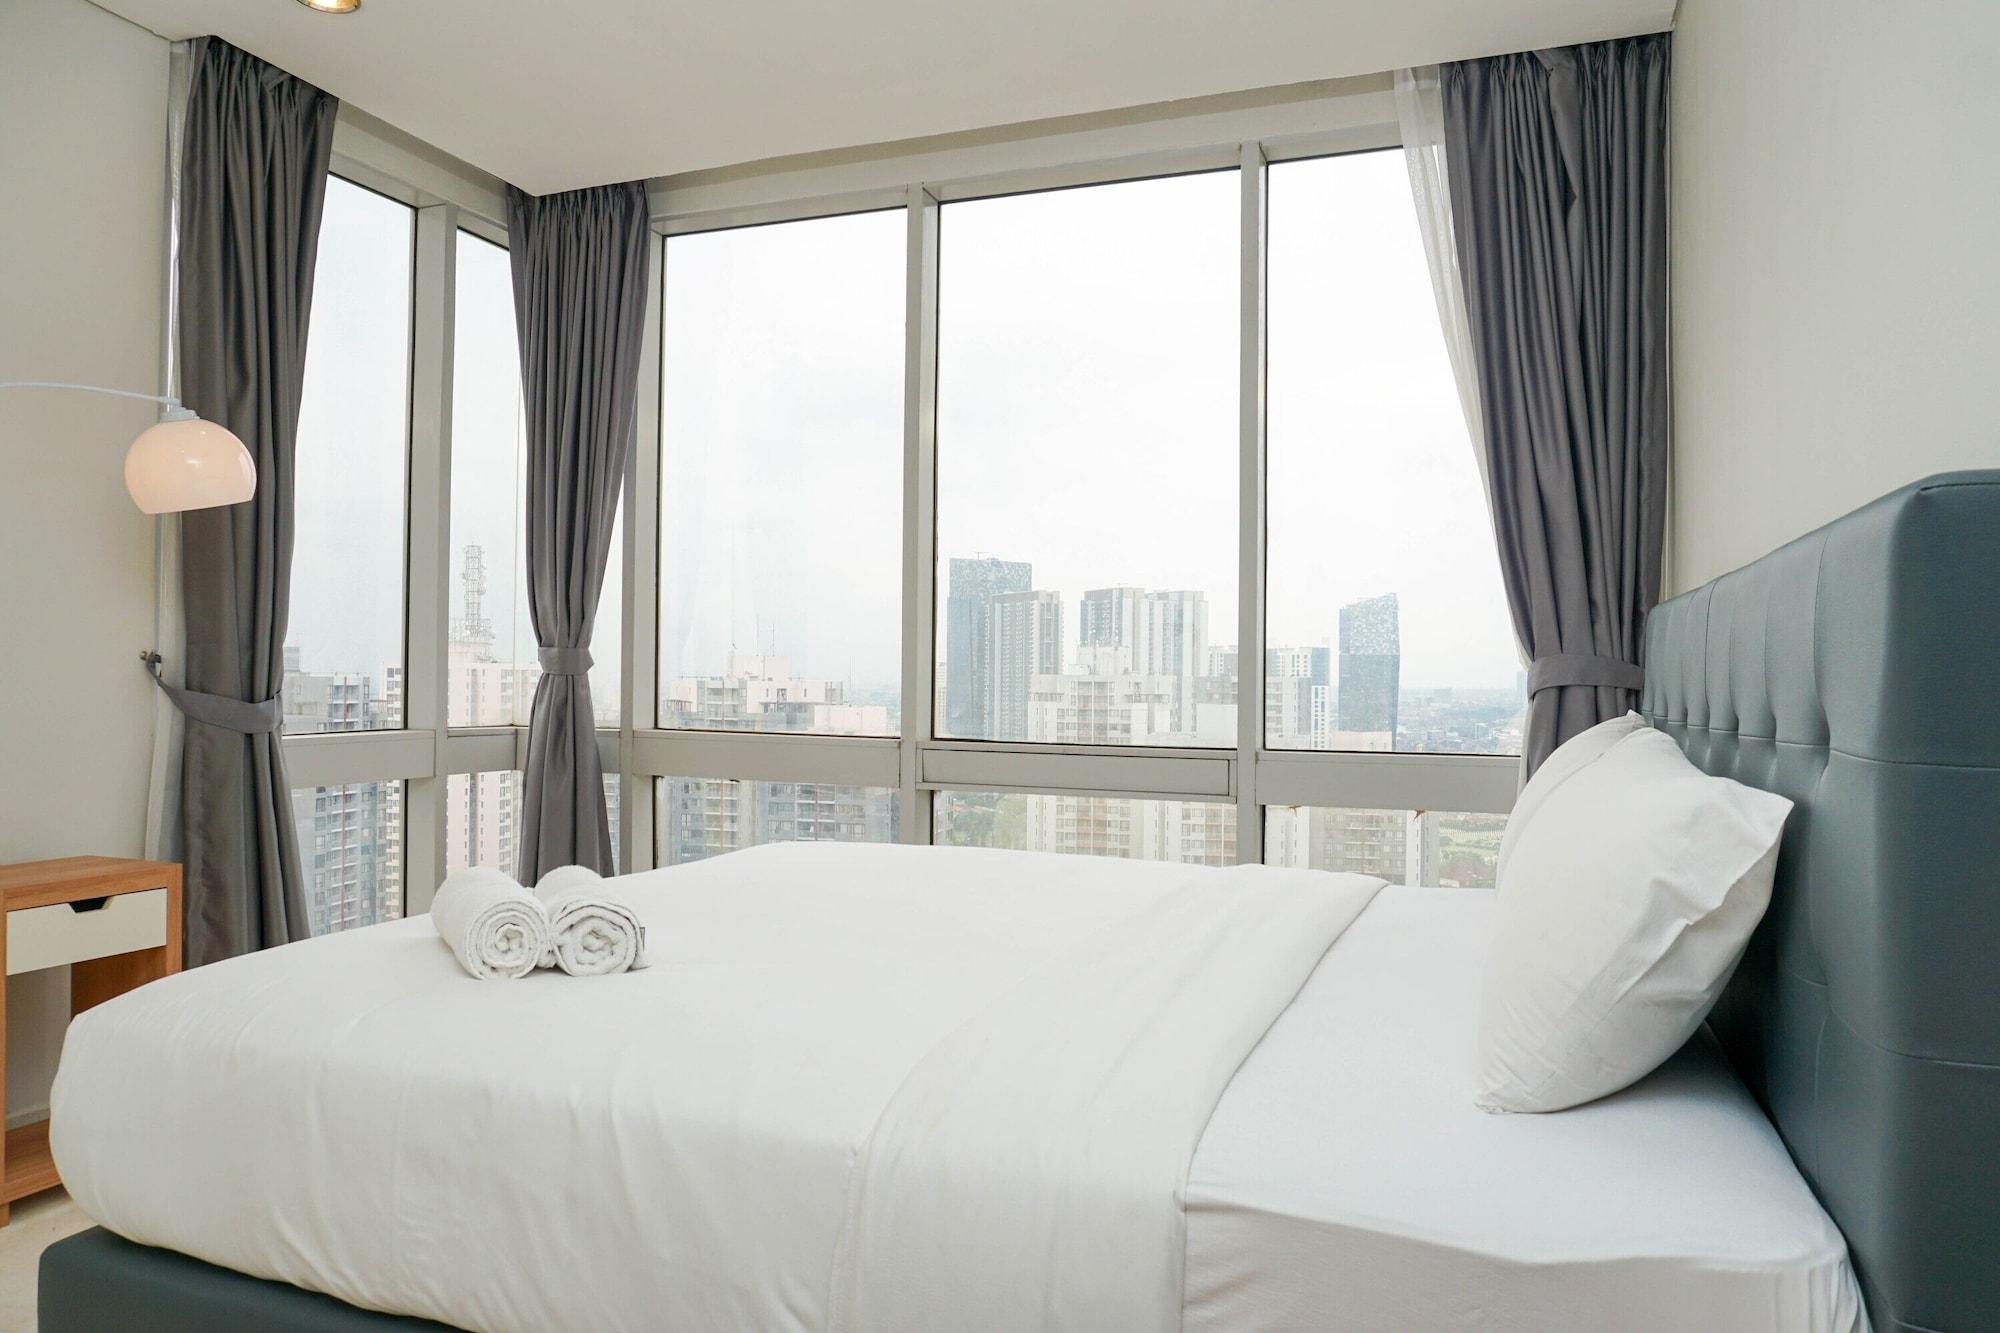 Relaxing 2BR at The Empyreal Condominium Epicentrum Apartment By Travelio, Jakarta Selatan